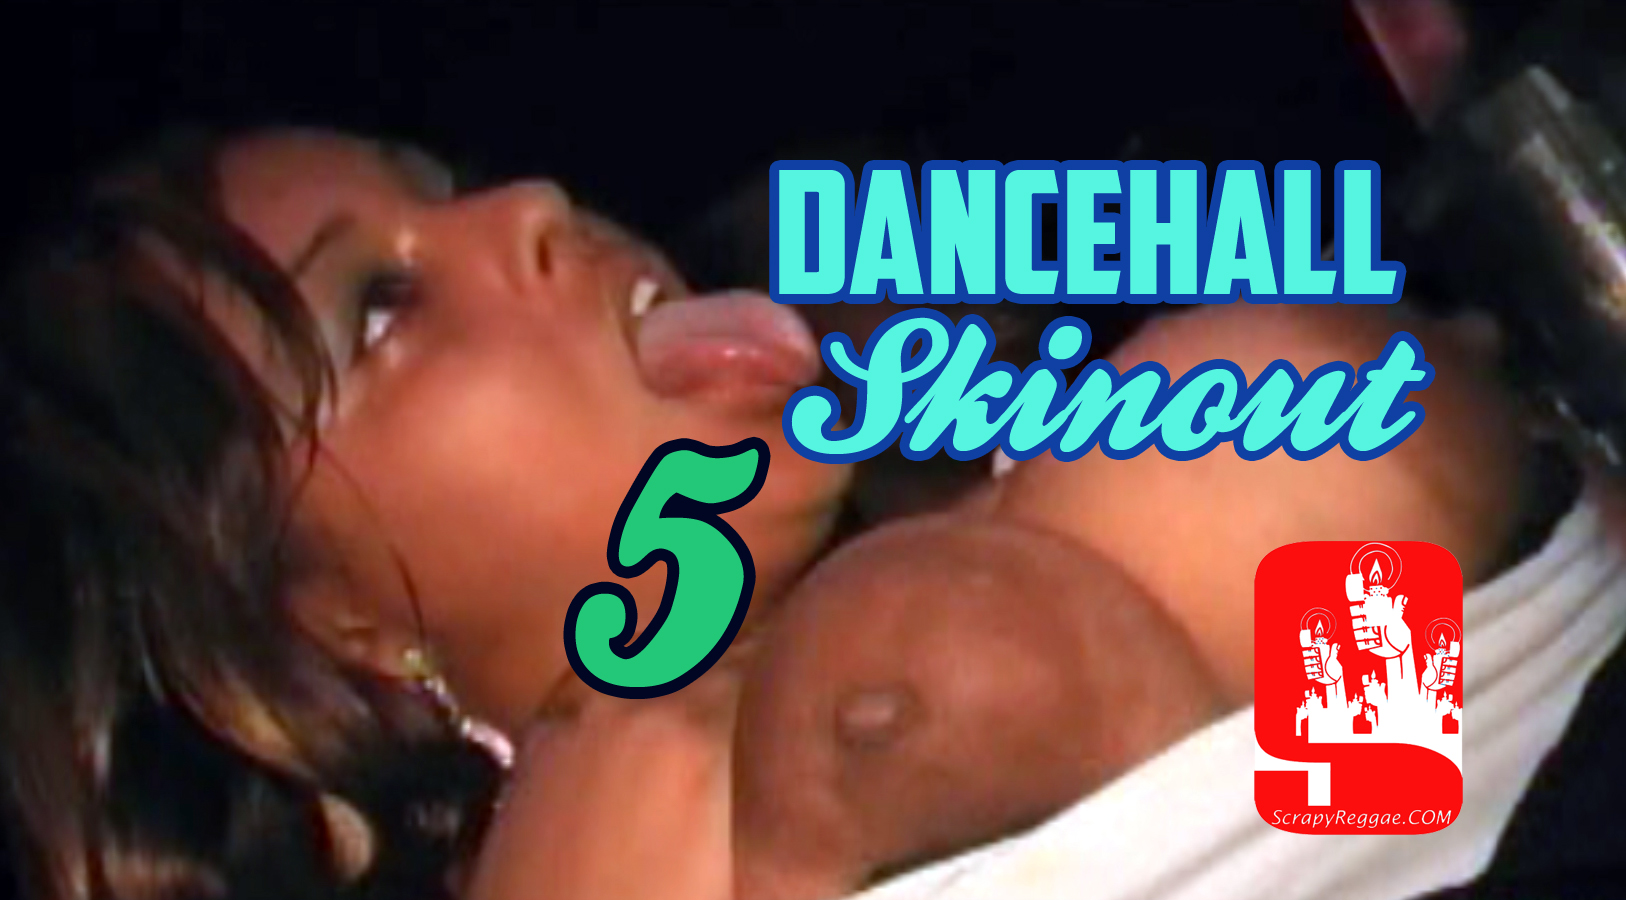 Dancehall skinout 5